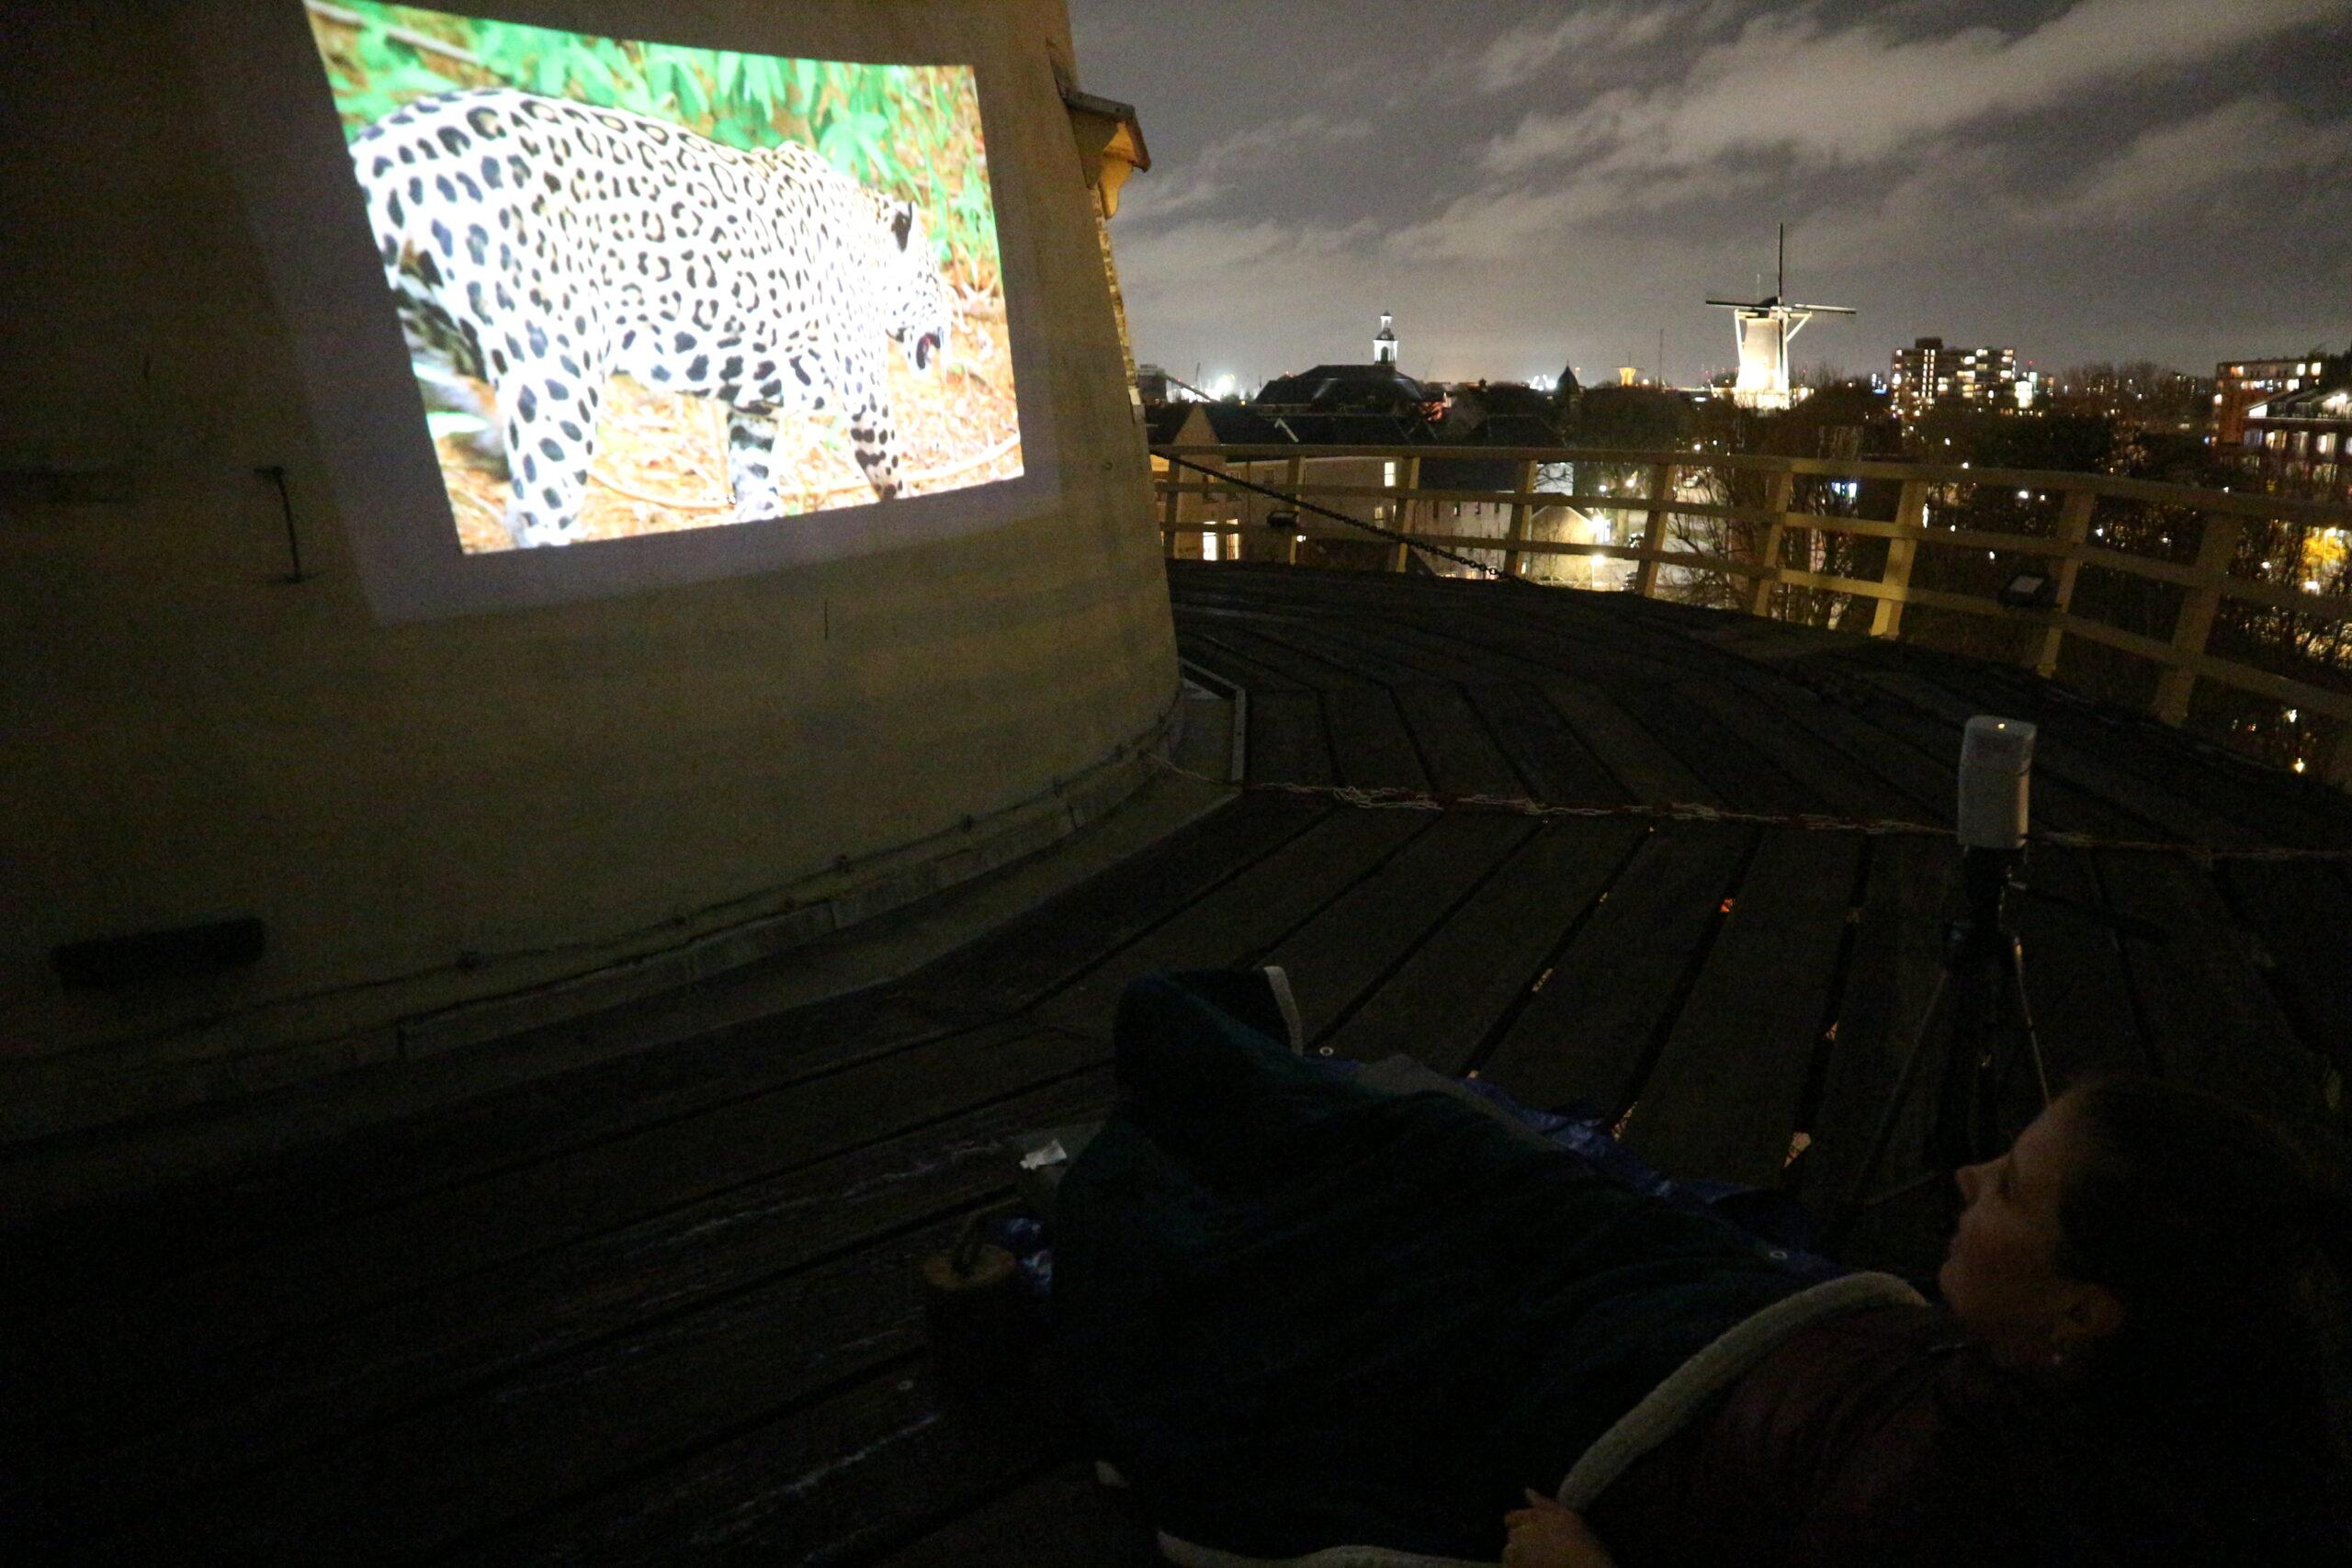 Benq GV1 projector